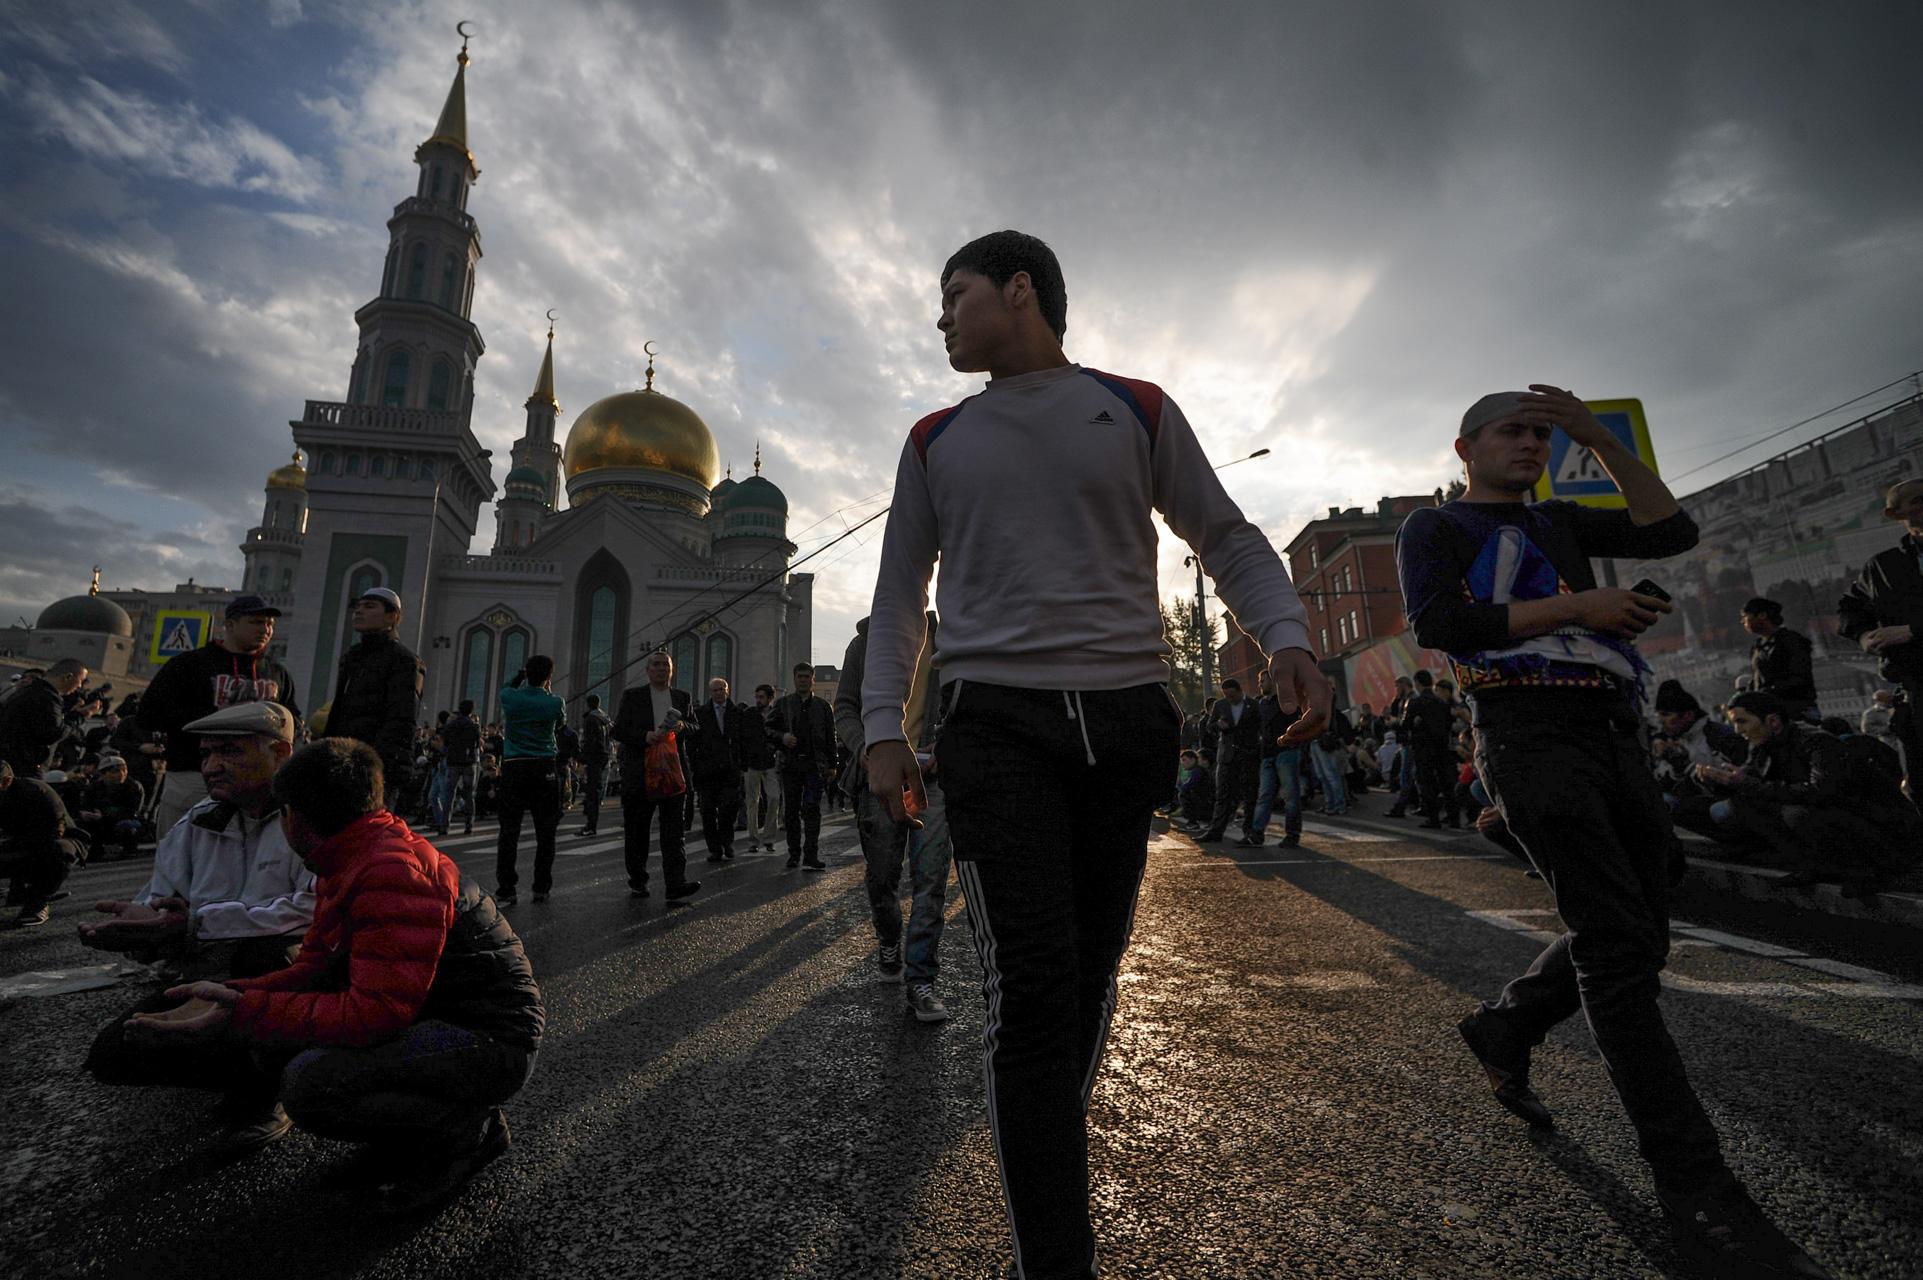 Moskow adalah rumah bagi sekitar dua juta umat Islam, yang setengah di antaranya merupakan imigran.